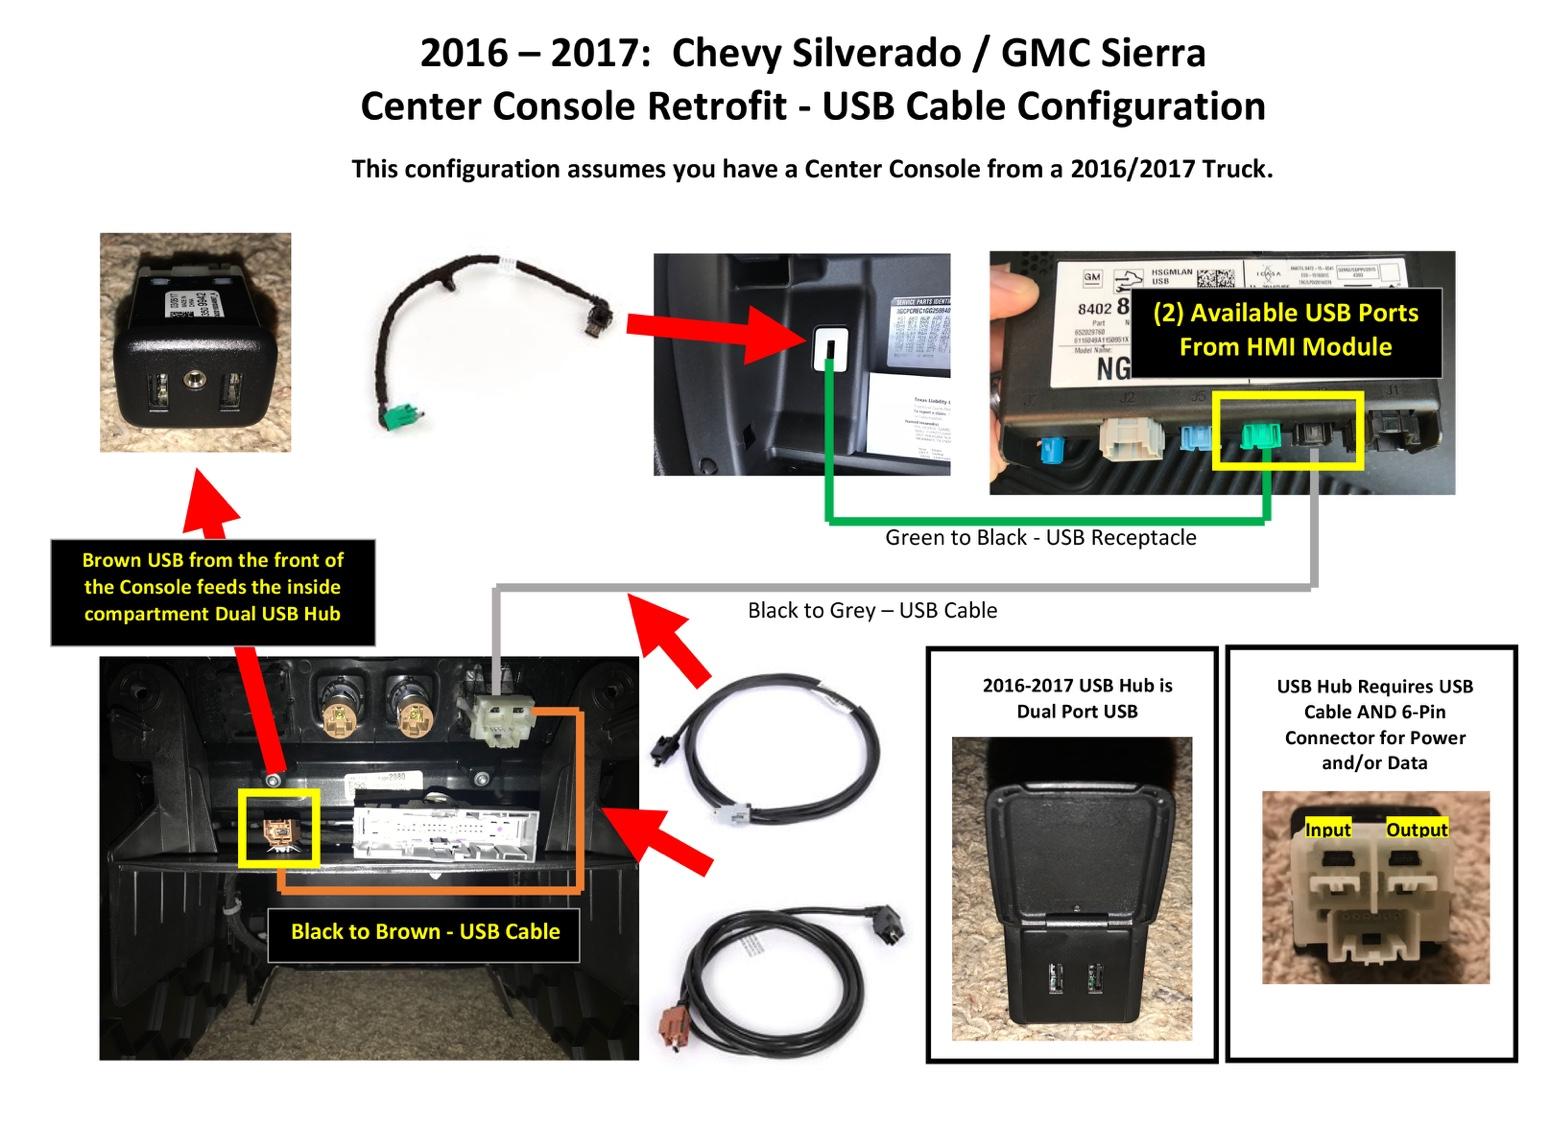 Gm 2016 Silverado 7 Pin Wiring Diagram Electrical Diagrams Usb 2014 K2xx Center Console Swap Retrofit Plug And Play Harness 98 Yukon Wire